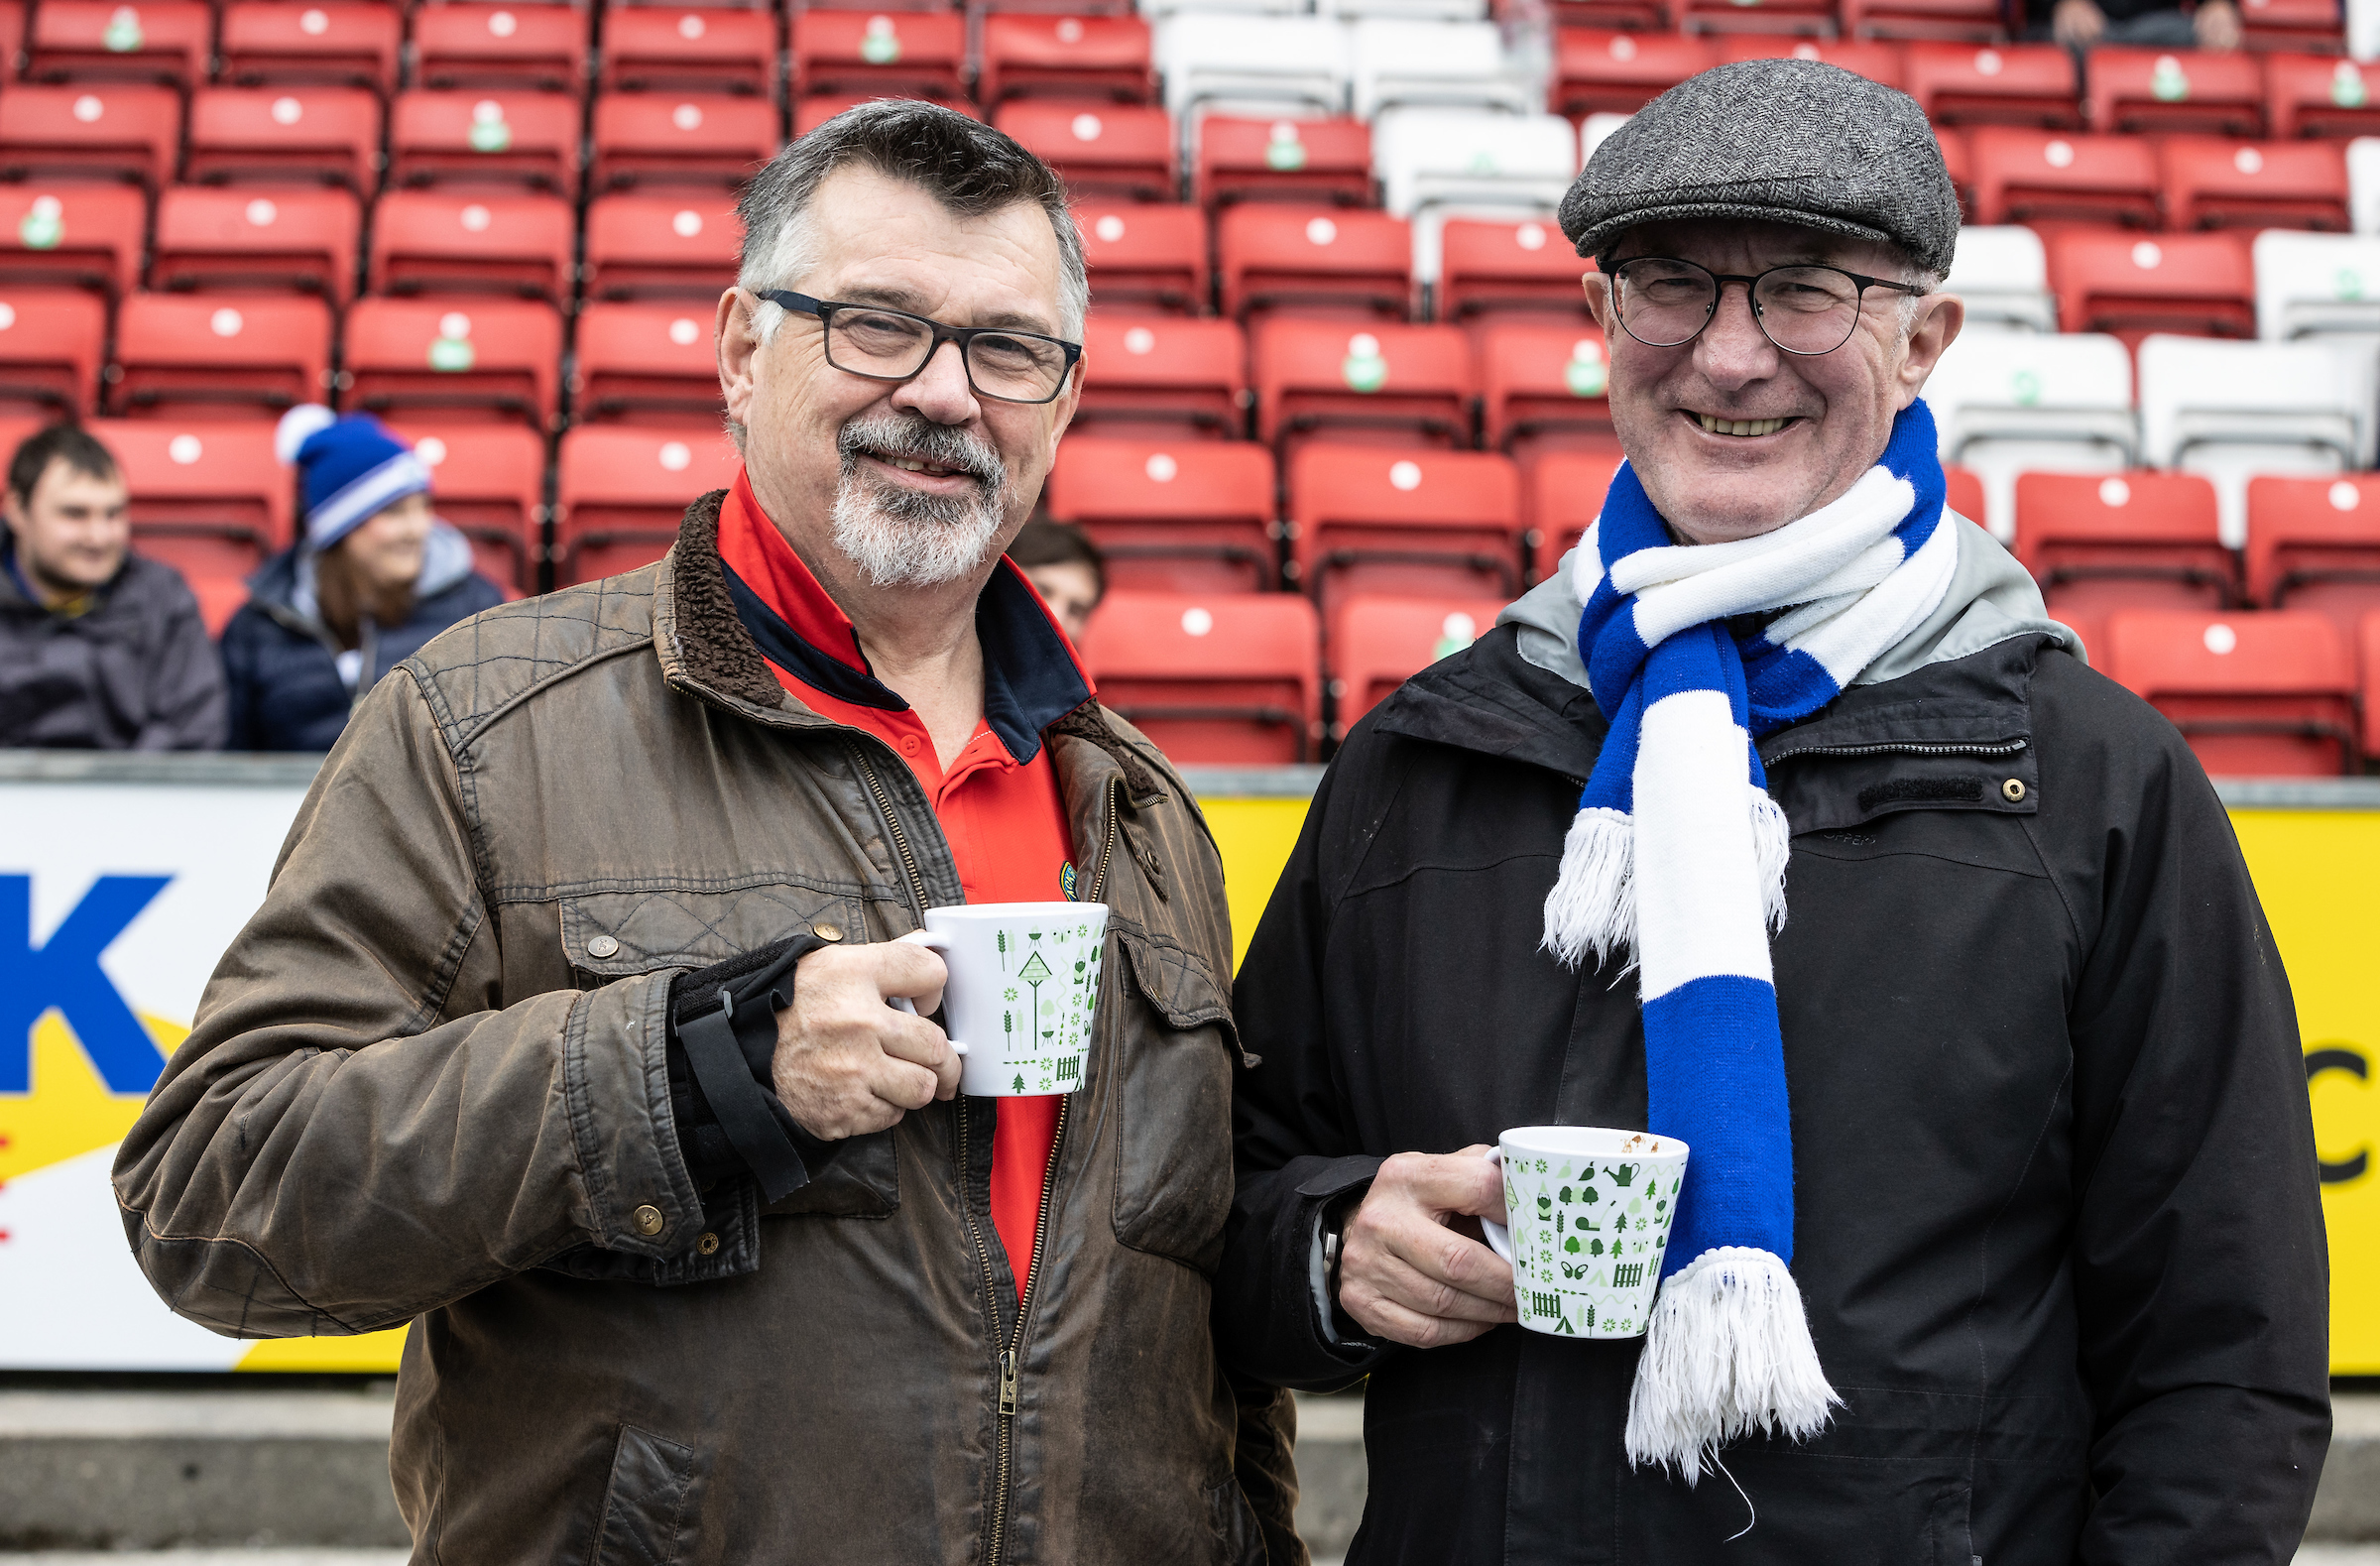 Blackburn Rovers v Reading – galería de fans de Ewood Park